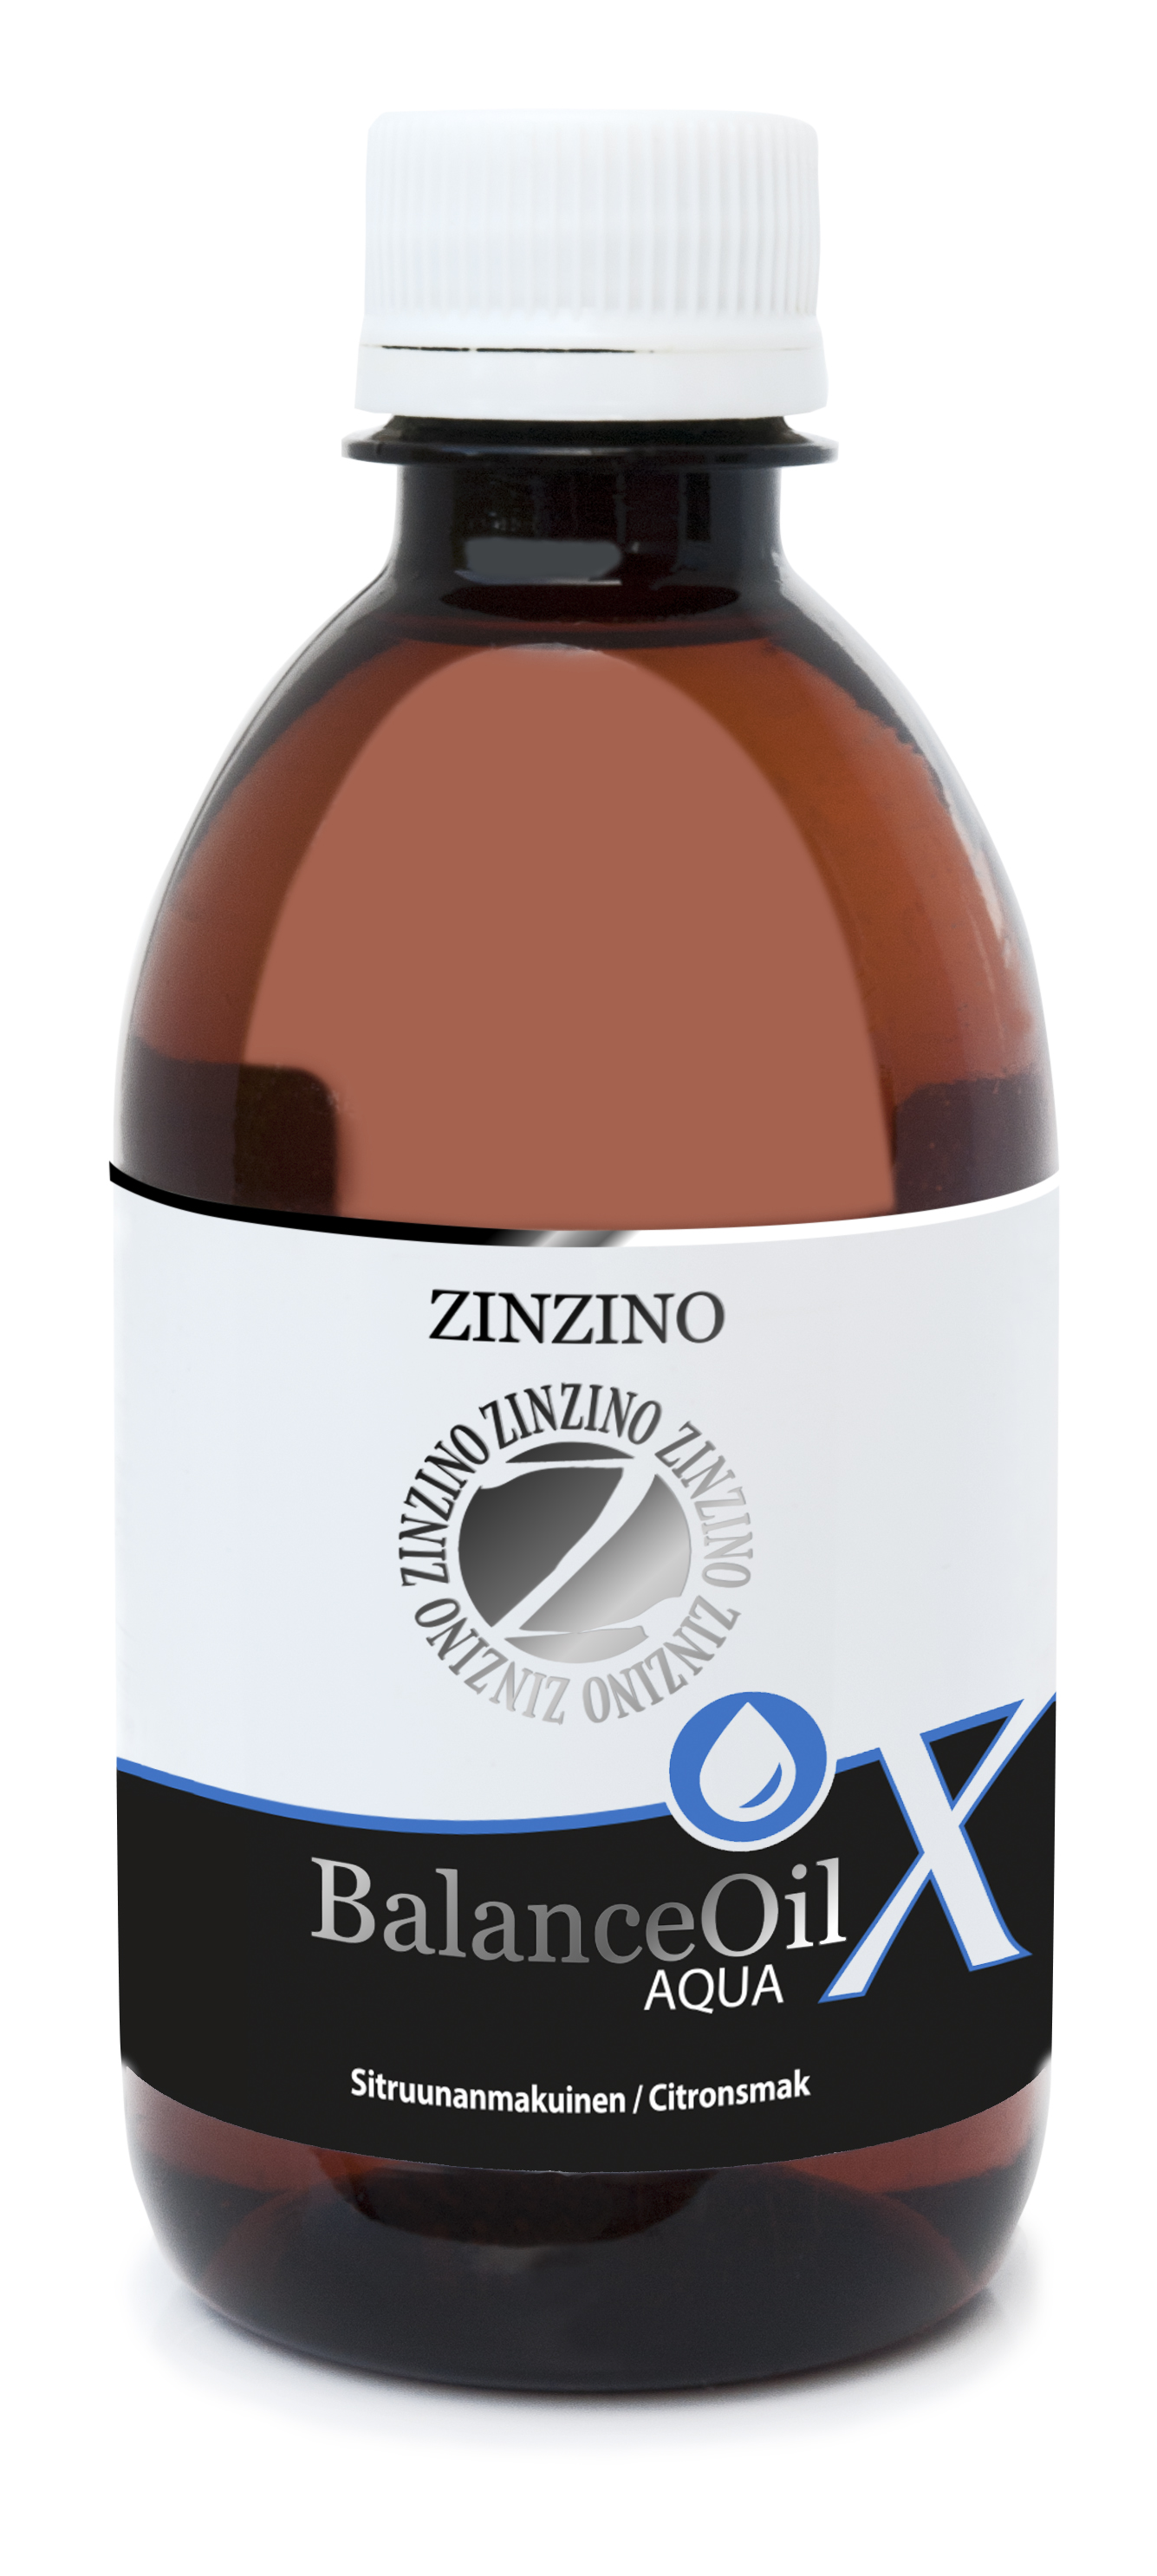 BalanceOil AquaX - Zinzino